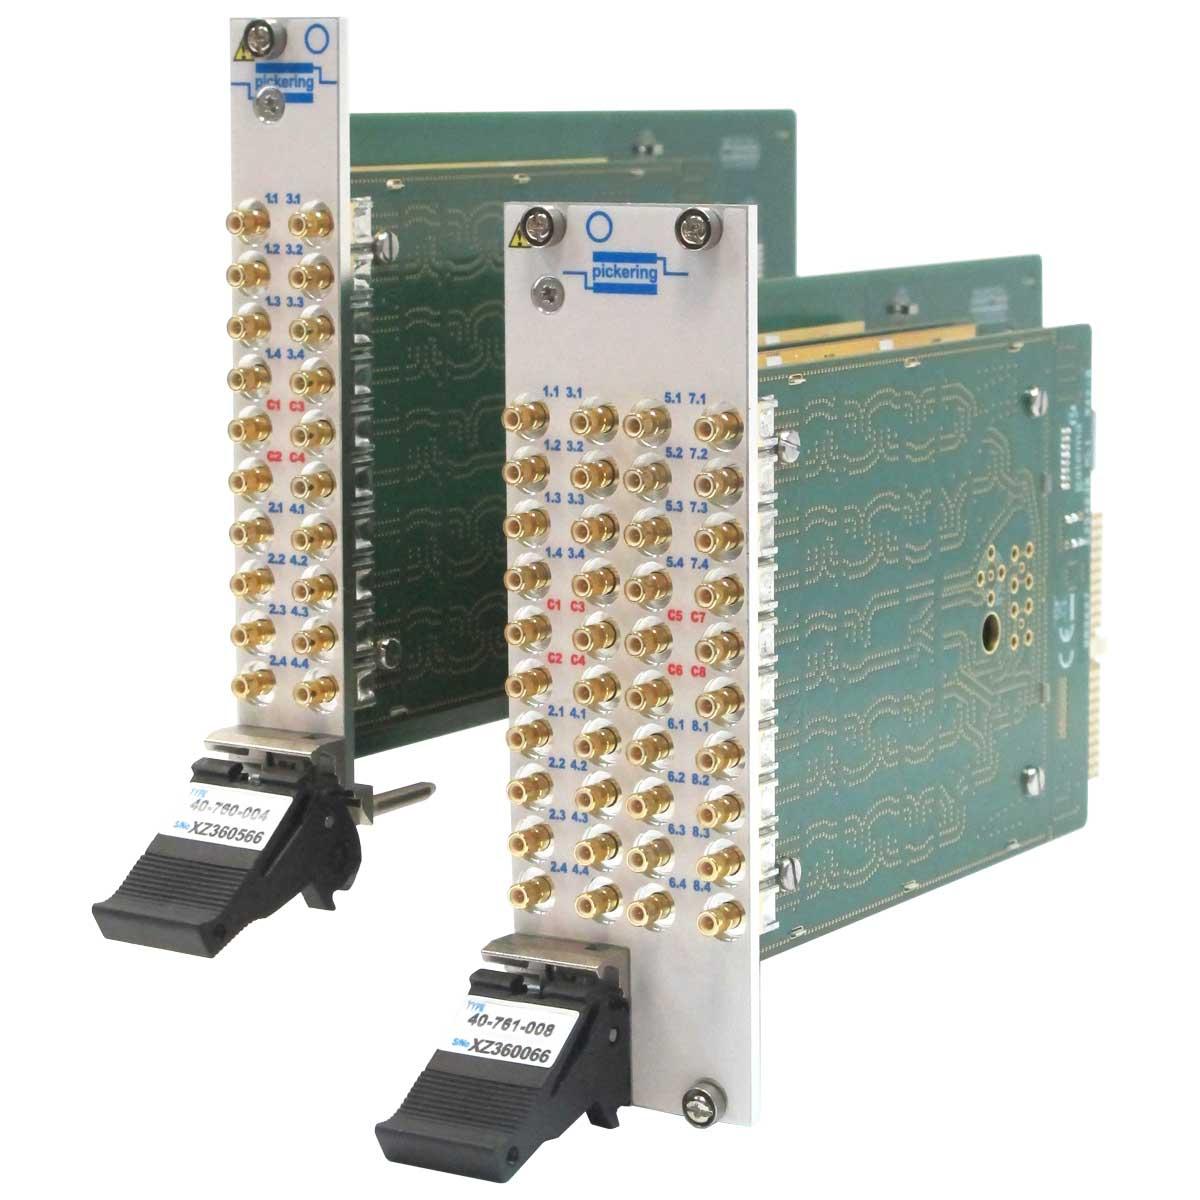 Dual 16 To 1 50 Ohm 600mhz Pxi Rf Multiplexer 40 764 002 General Block Diagram Of